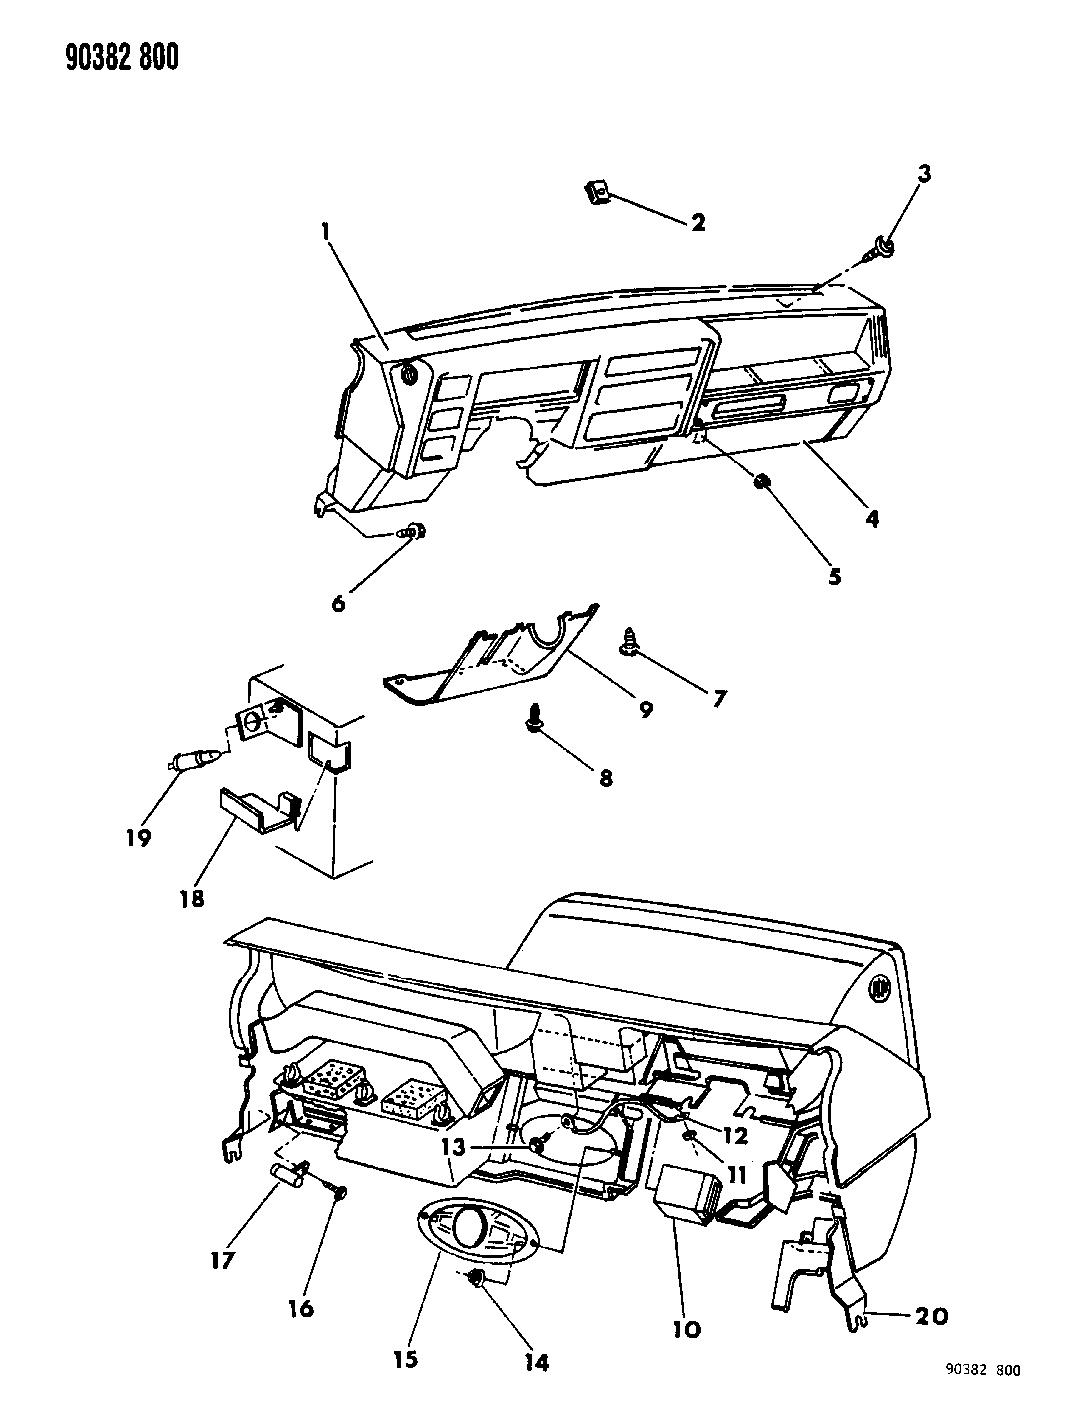 1993 Dodge Dakota Instrument Panel Glove Box - Panel